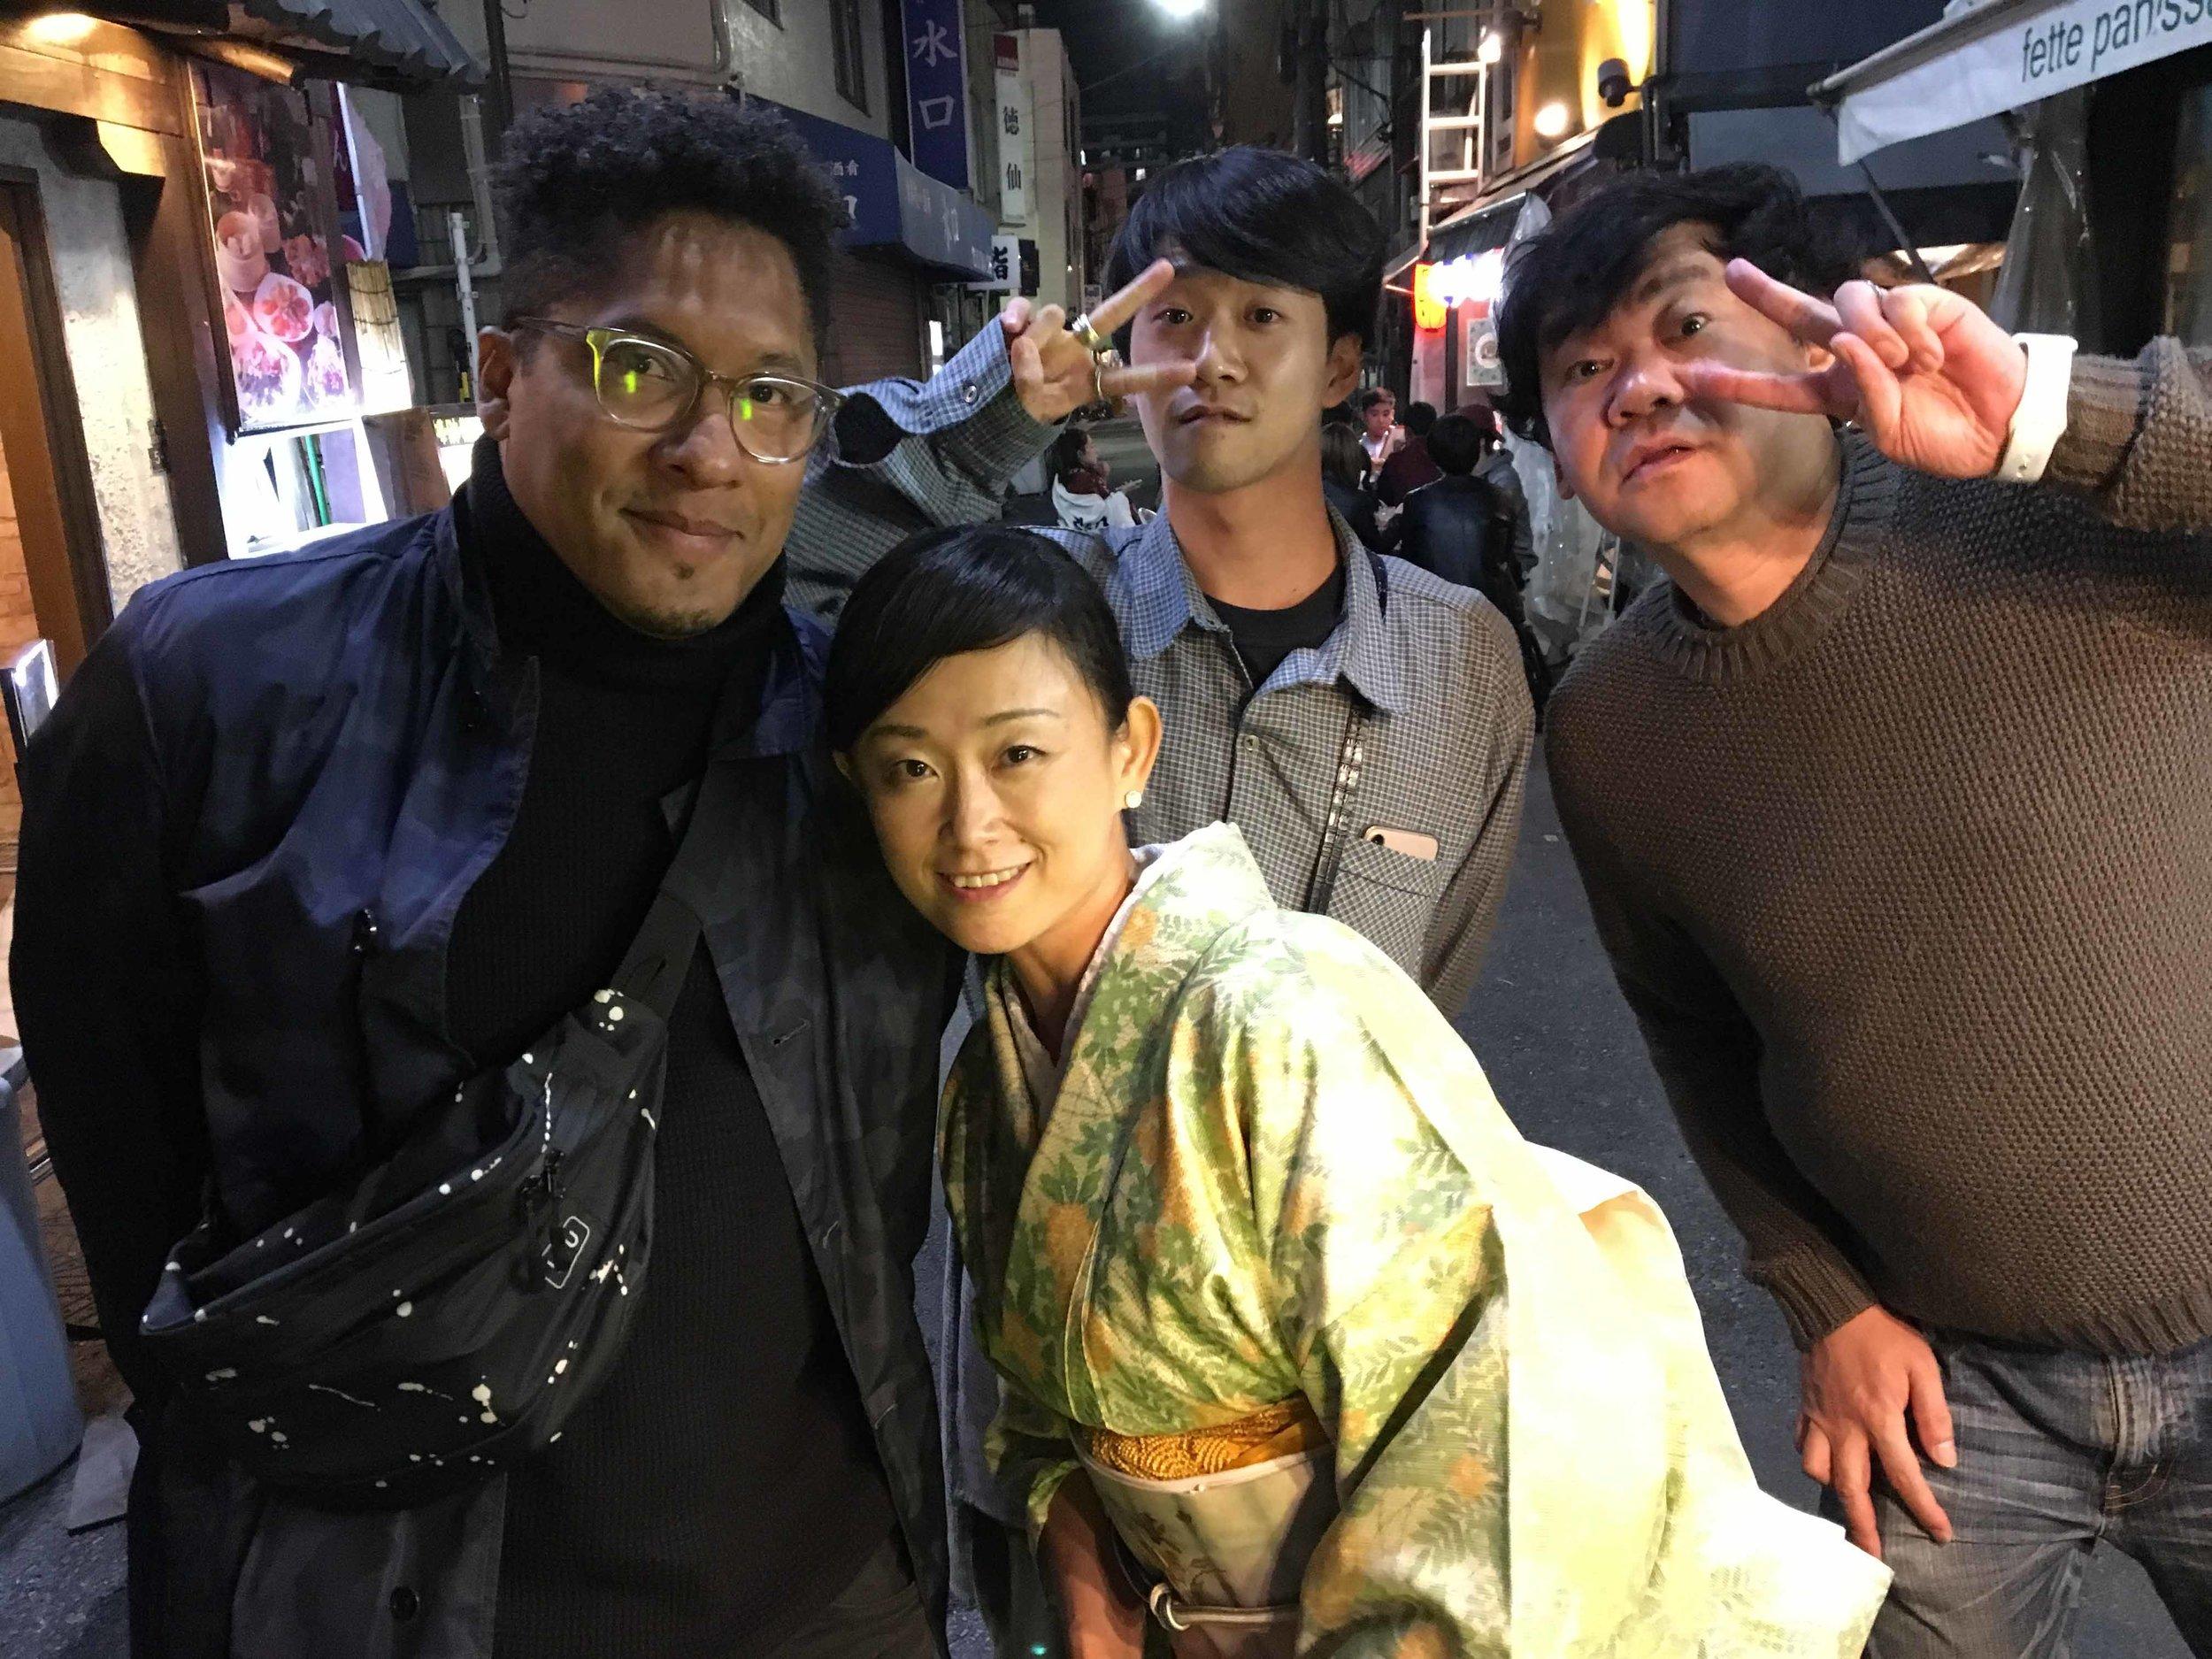 an evening in Asakusa